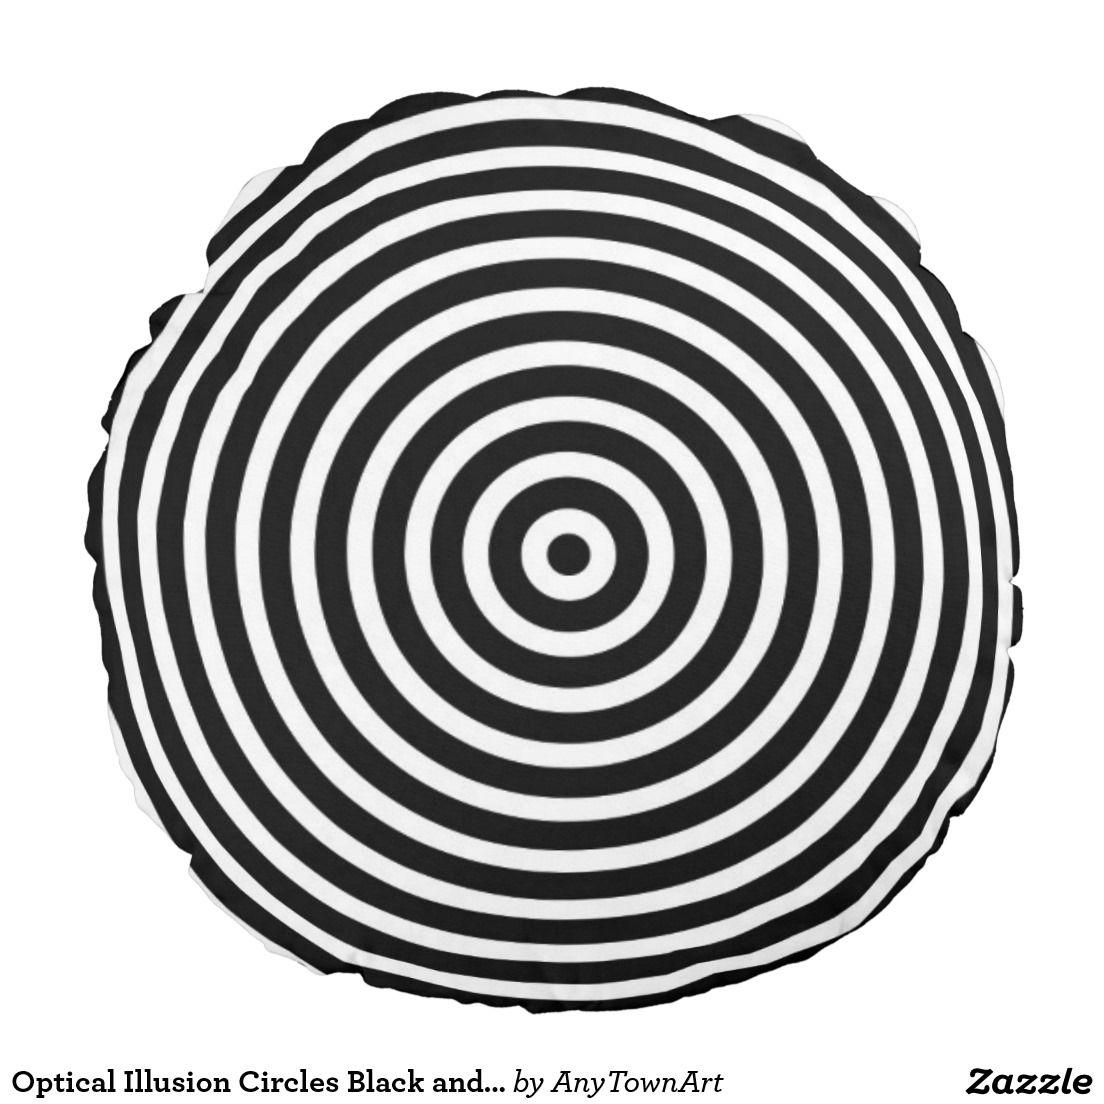 Optical Illusion Circles Black And White Round Pillow Zazzle Com Black And White Illusions Optical Illusions Black And White Design